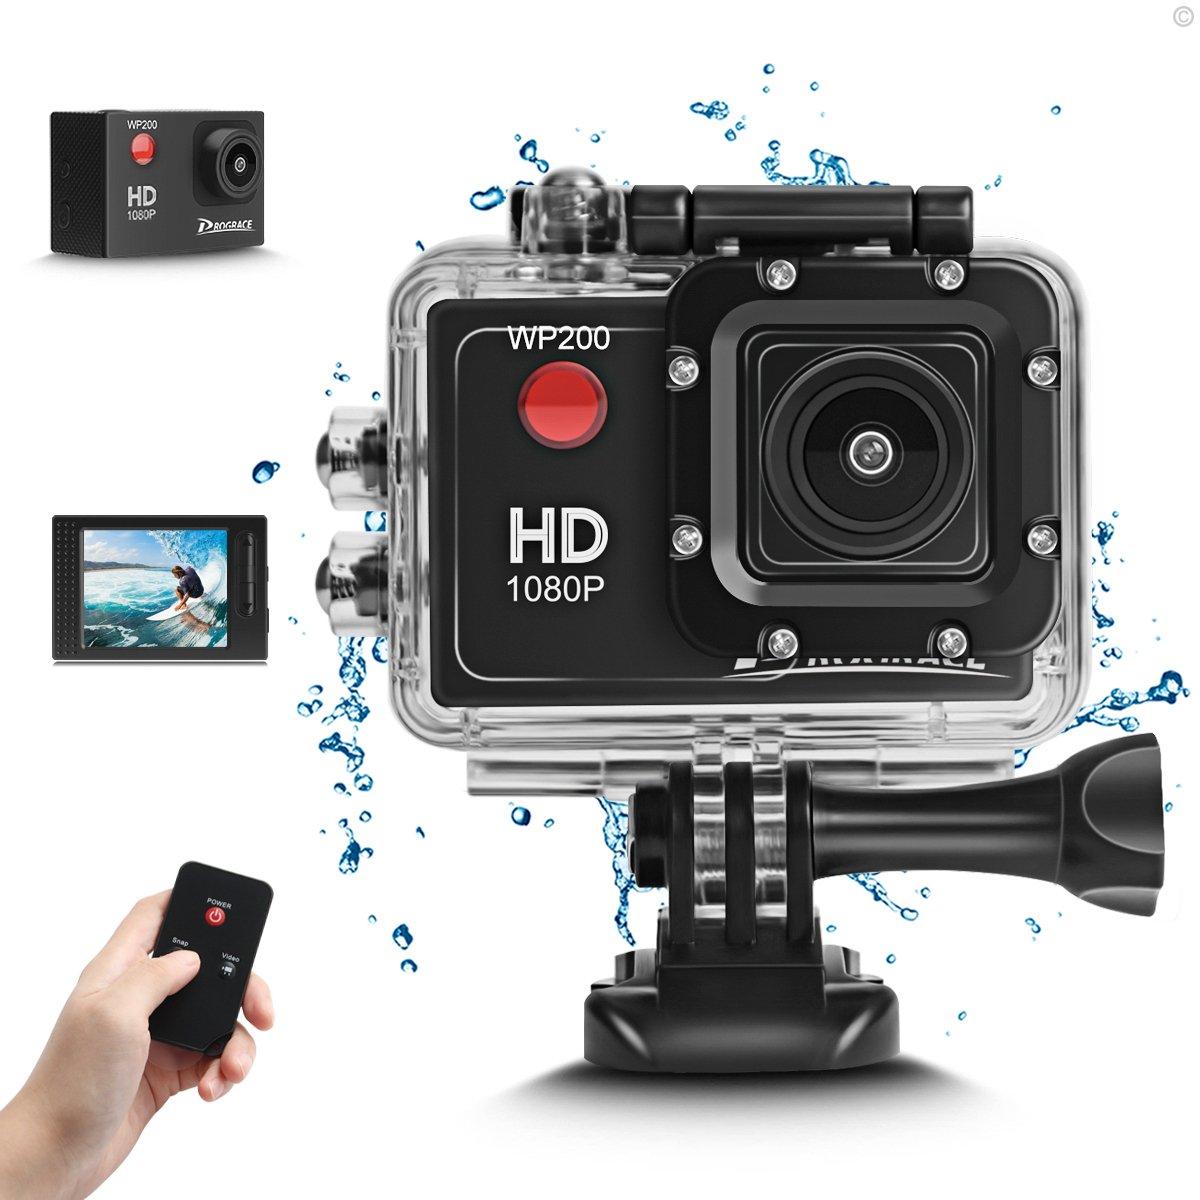 DROGRACE WP200 Sports Action Camera Video Camera Waterproof Digital Cam Car Dash Cam Full HD 1080P 12MP 25fps 30fps Helmet Mount Accessories Camera Kit 2 Inch LCD Screen